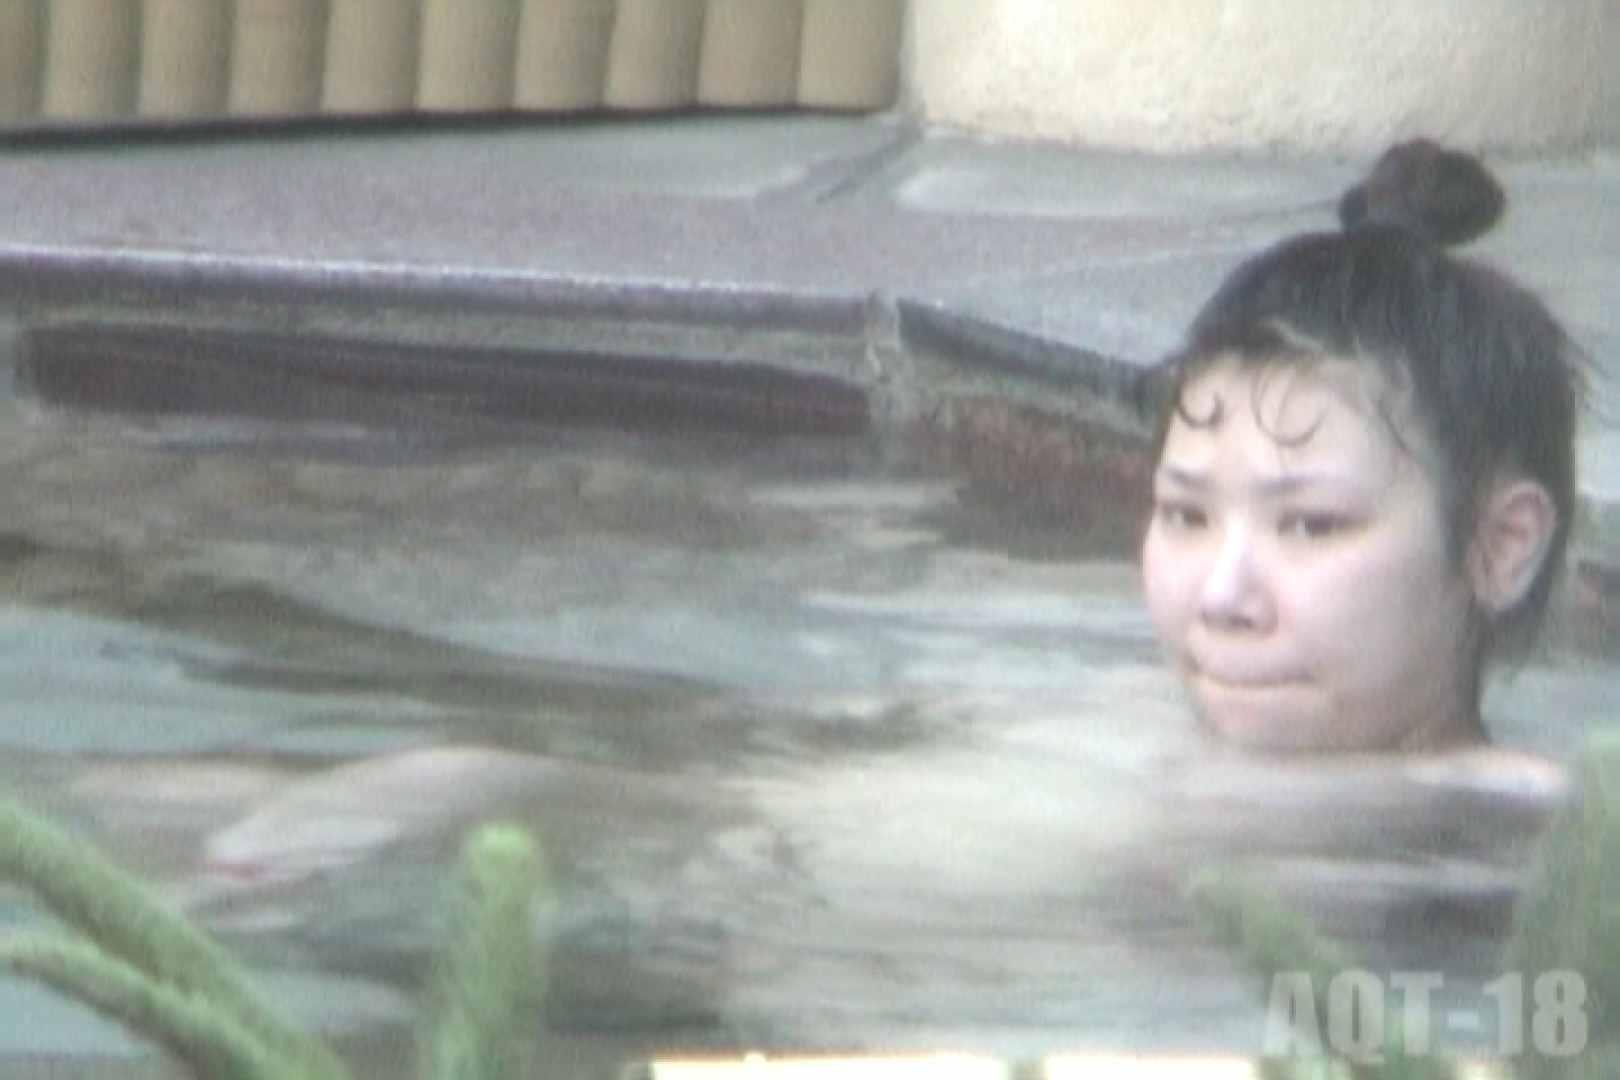 Aquaな露天風呂Vol.855 露天風呂編 | 盗撮シリーズ  86PIX 13